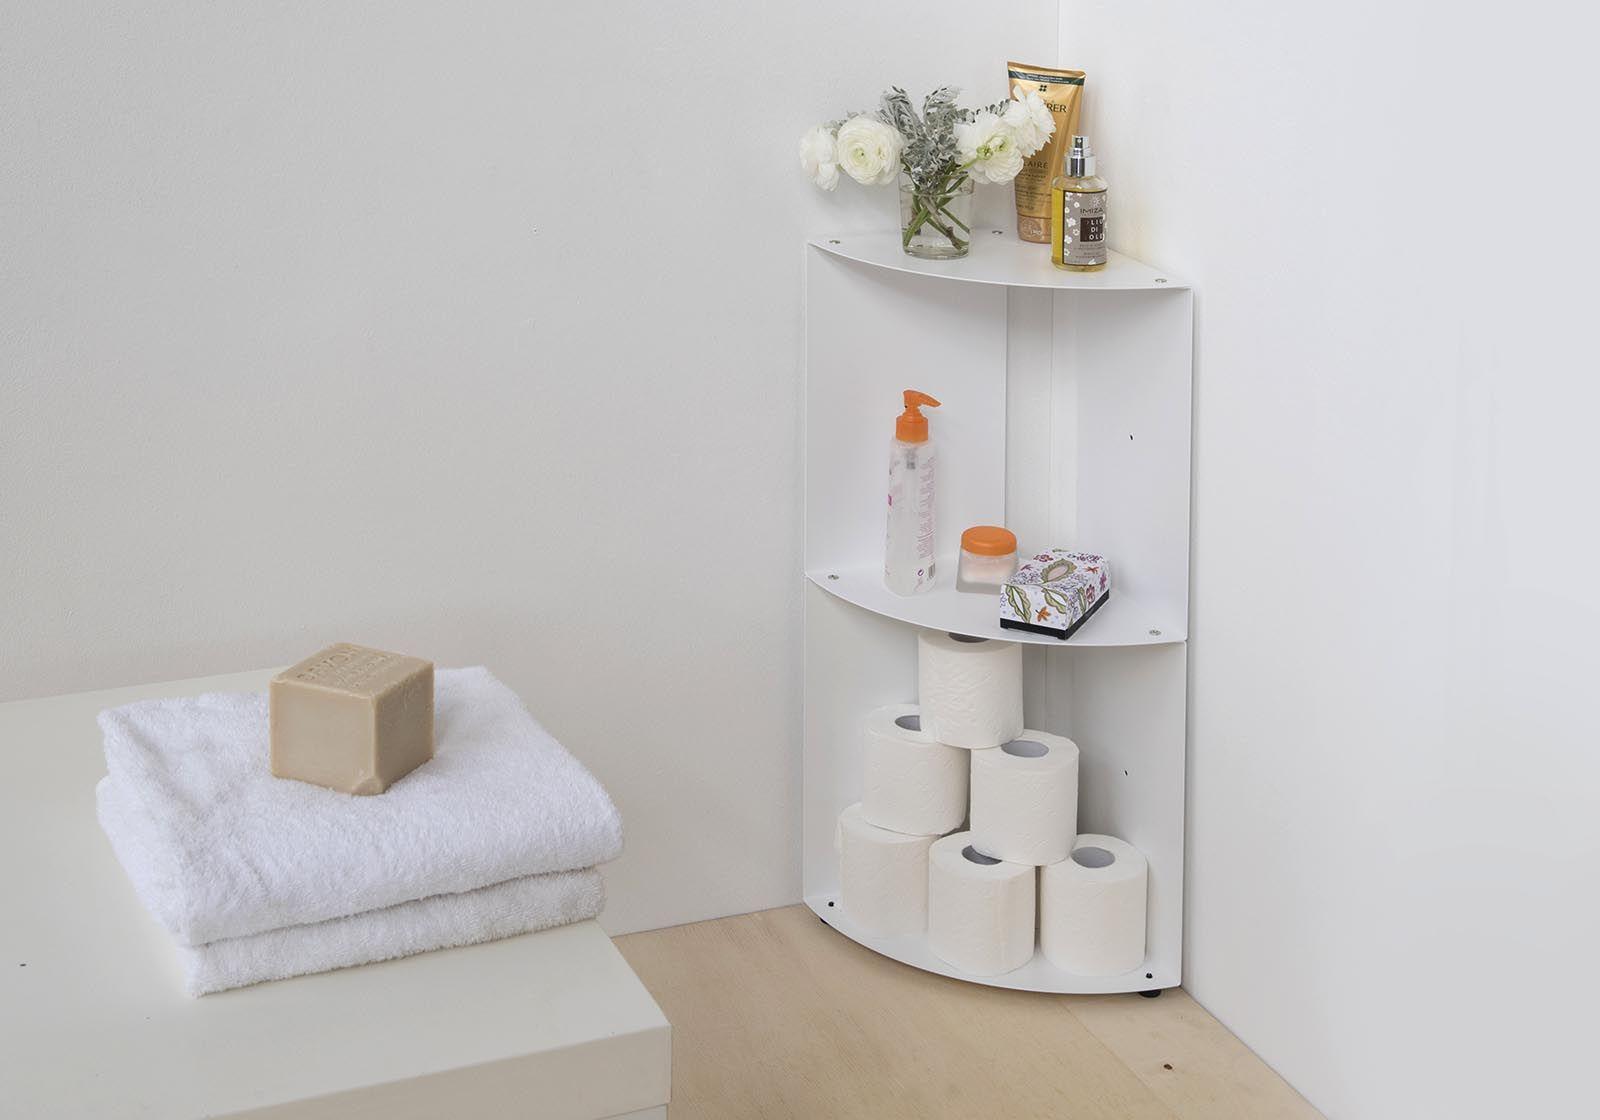 Tapis Salle De Bain Tigre Geant ~ etagere salle de bain alinea finest accessoires salle de bain